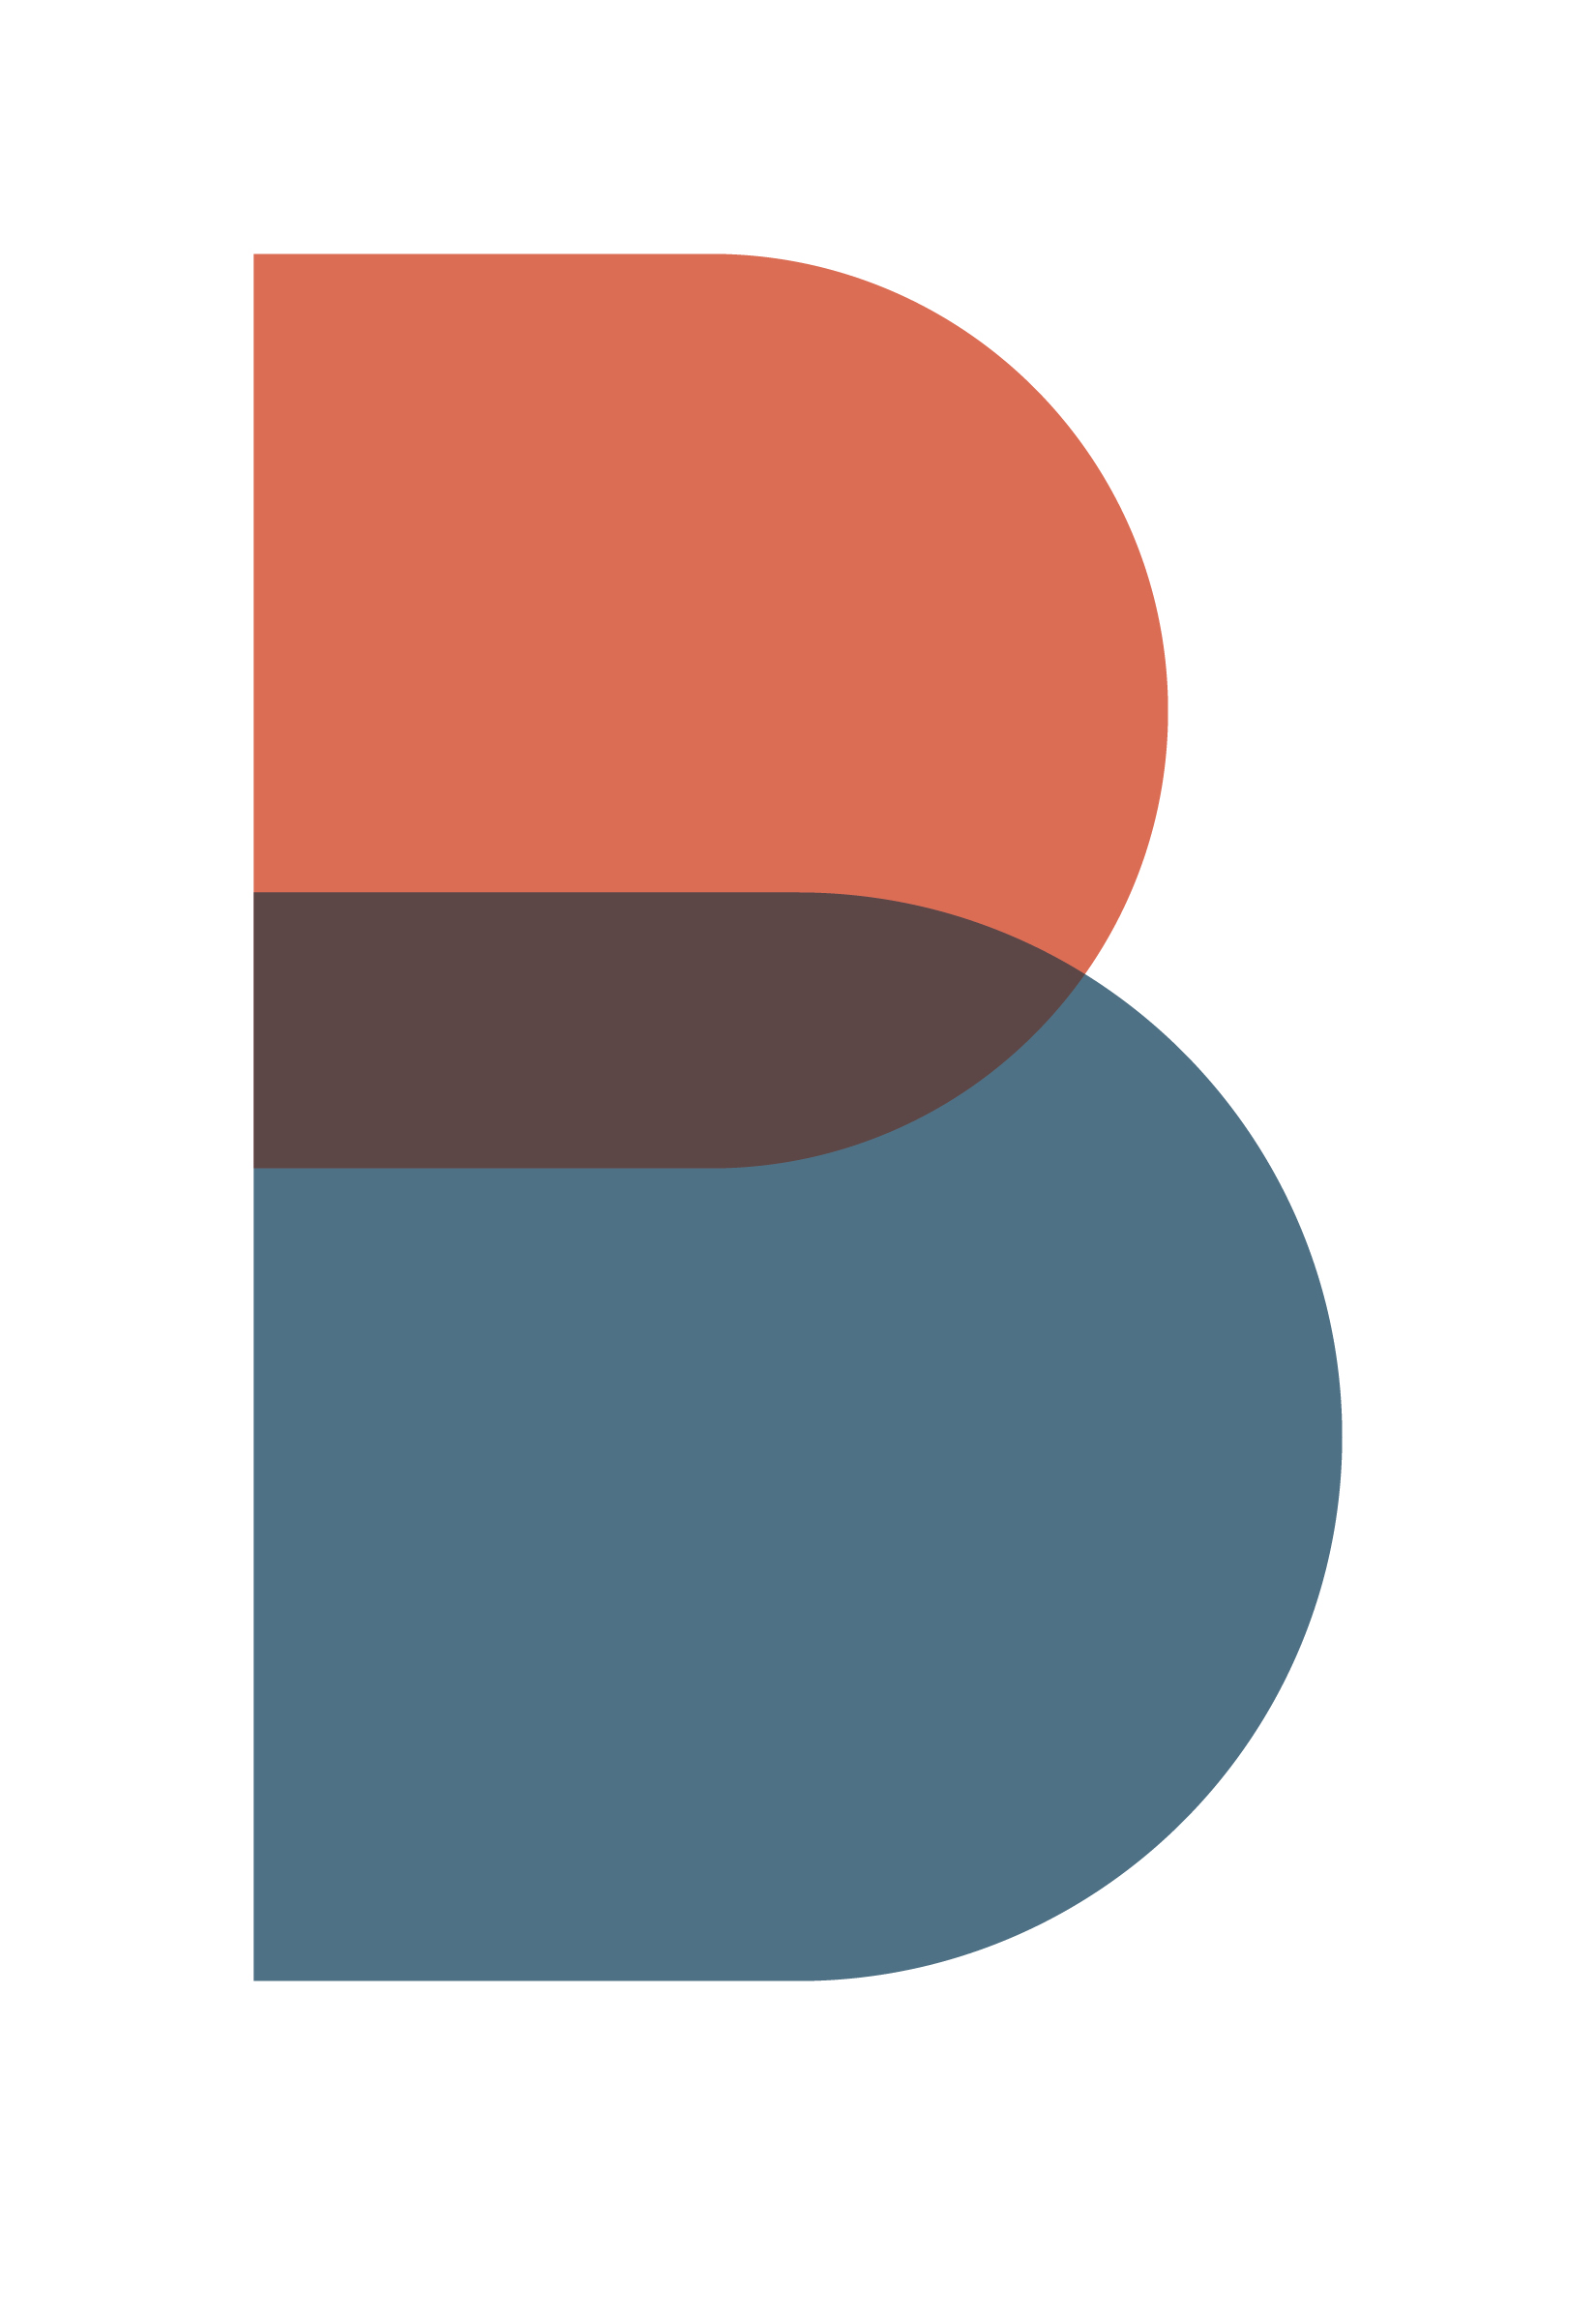 knitcon_alpha2.jpg